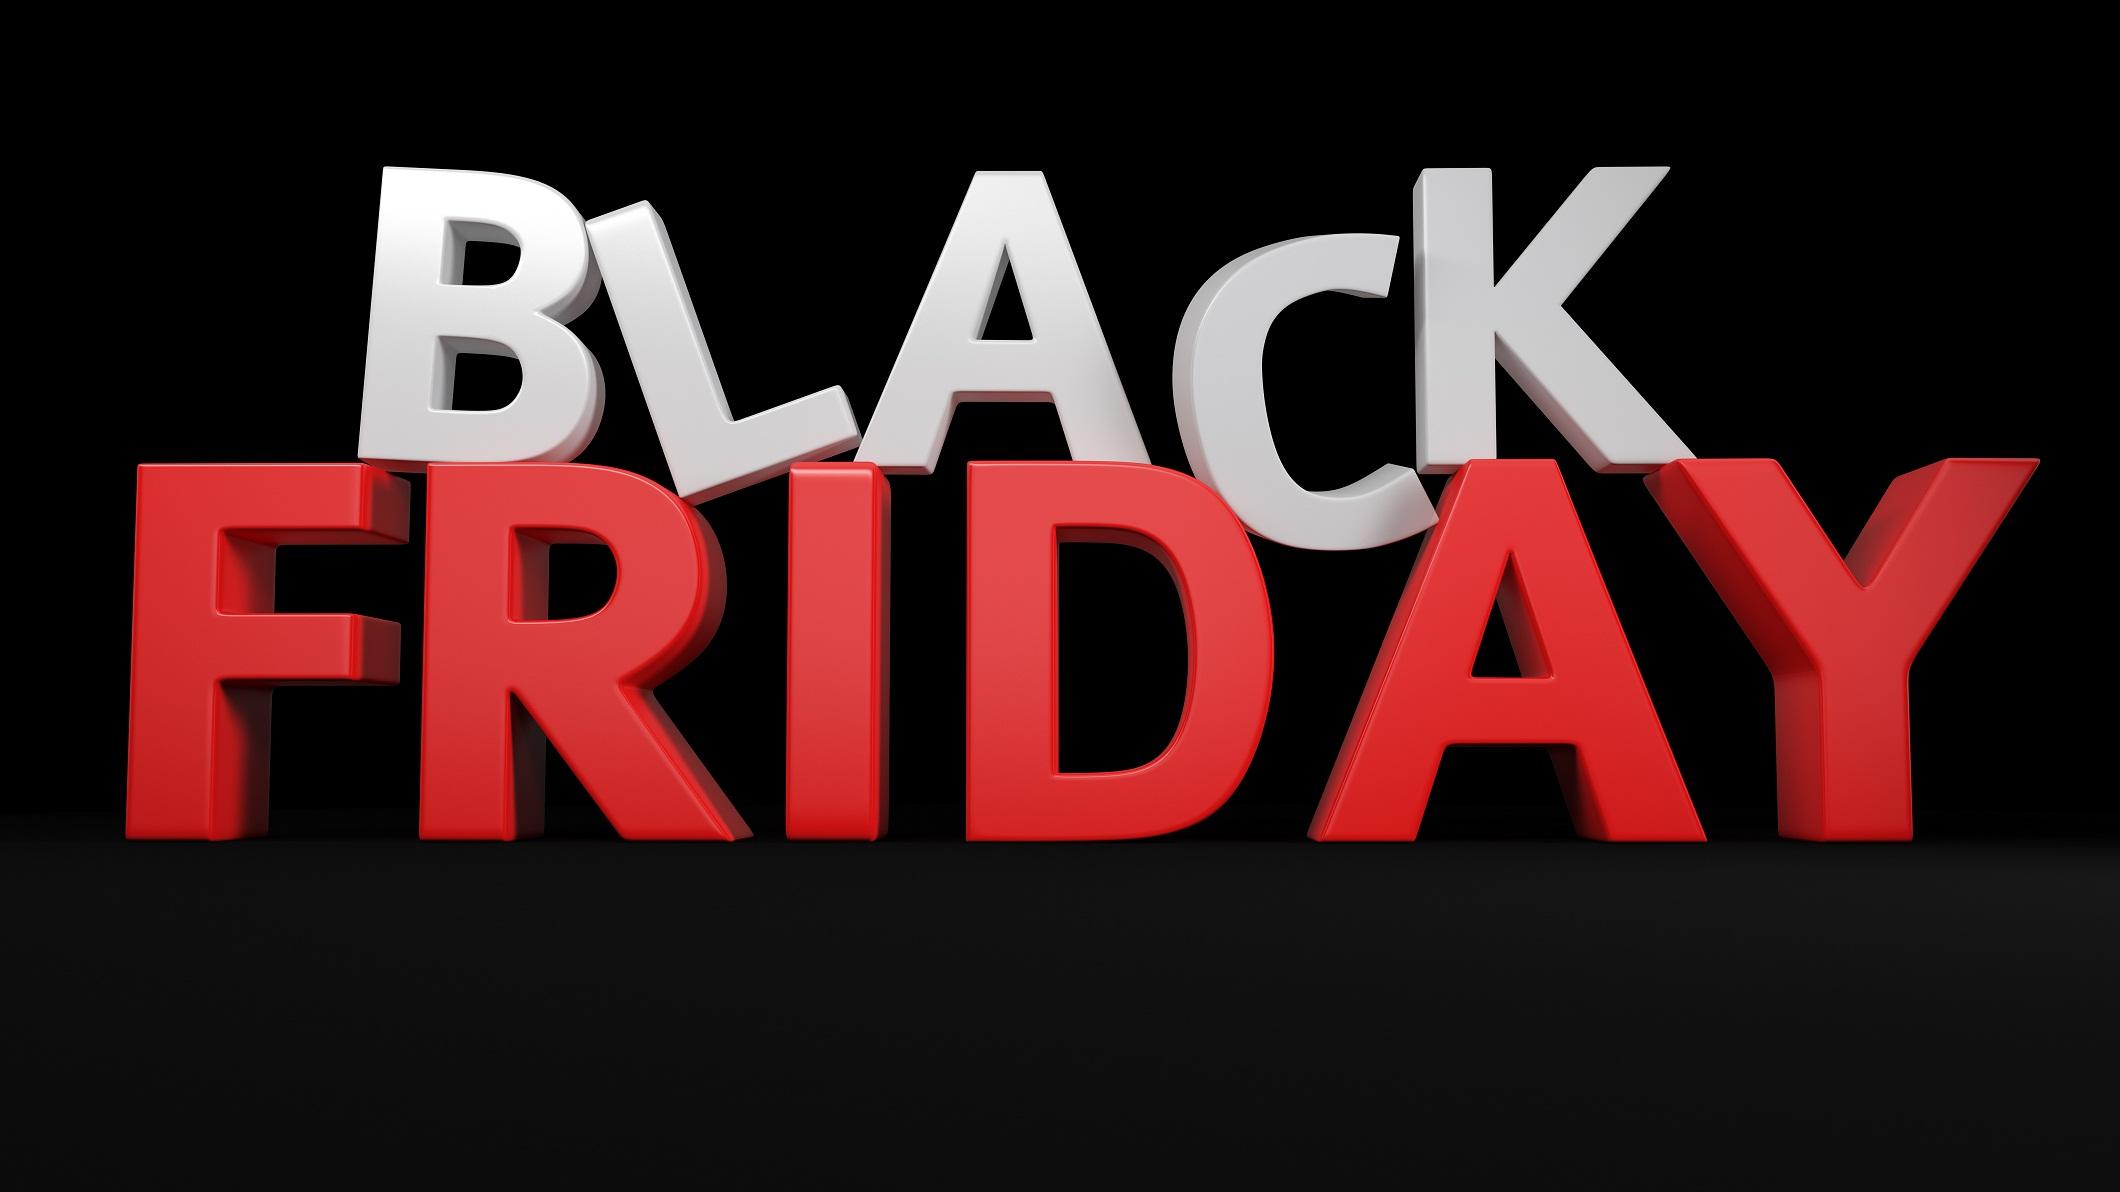 Black Friday 3D Logo Wallpaper SME Sales Ltd Ireland SME Sales 2120x1192